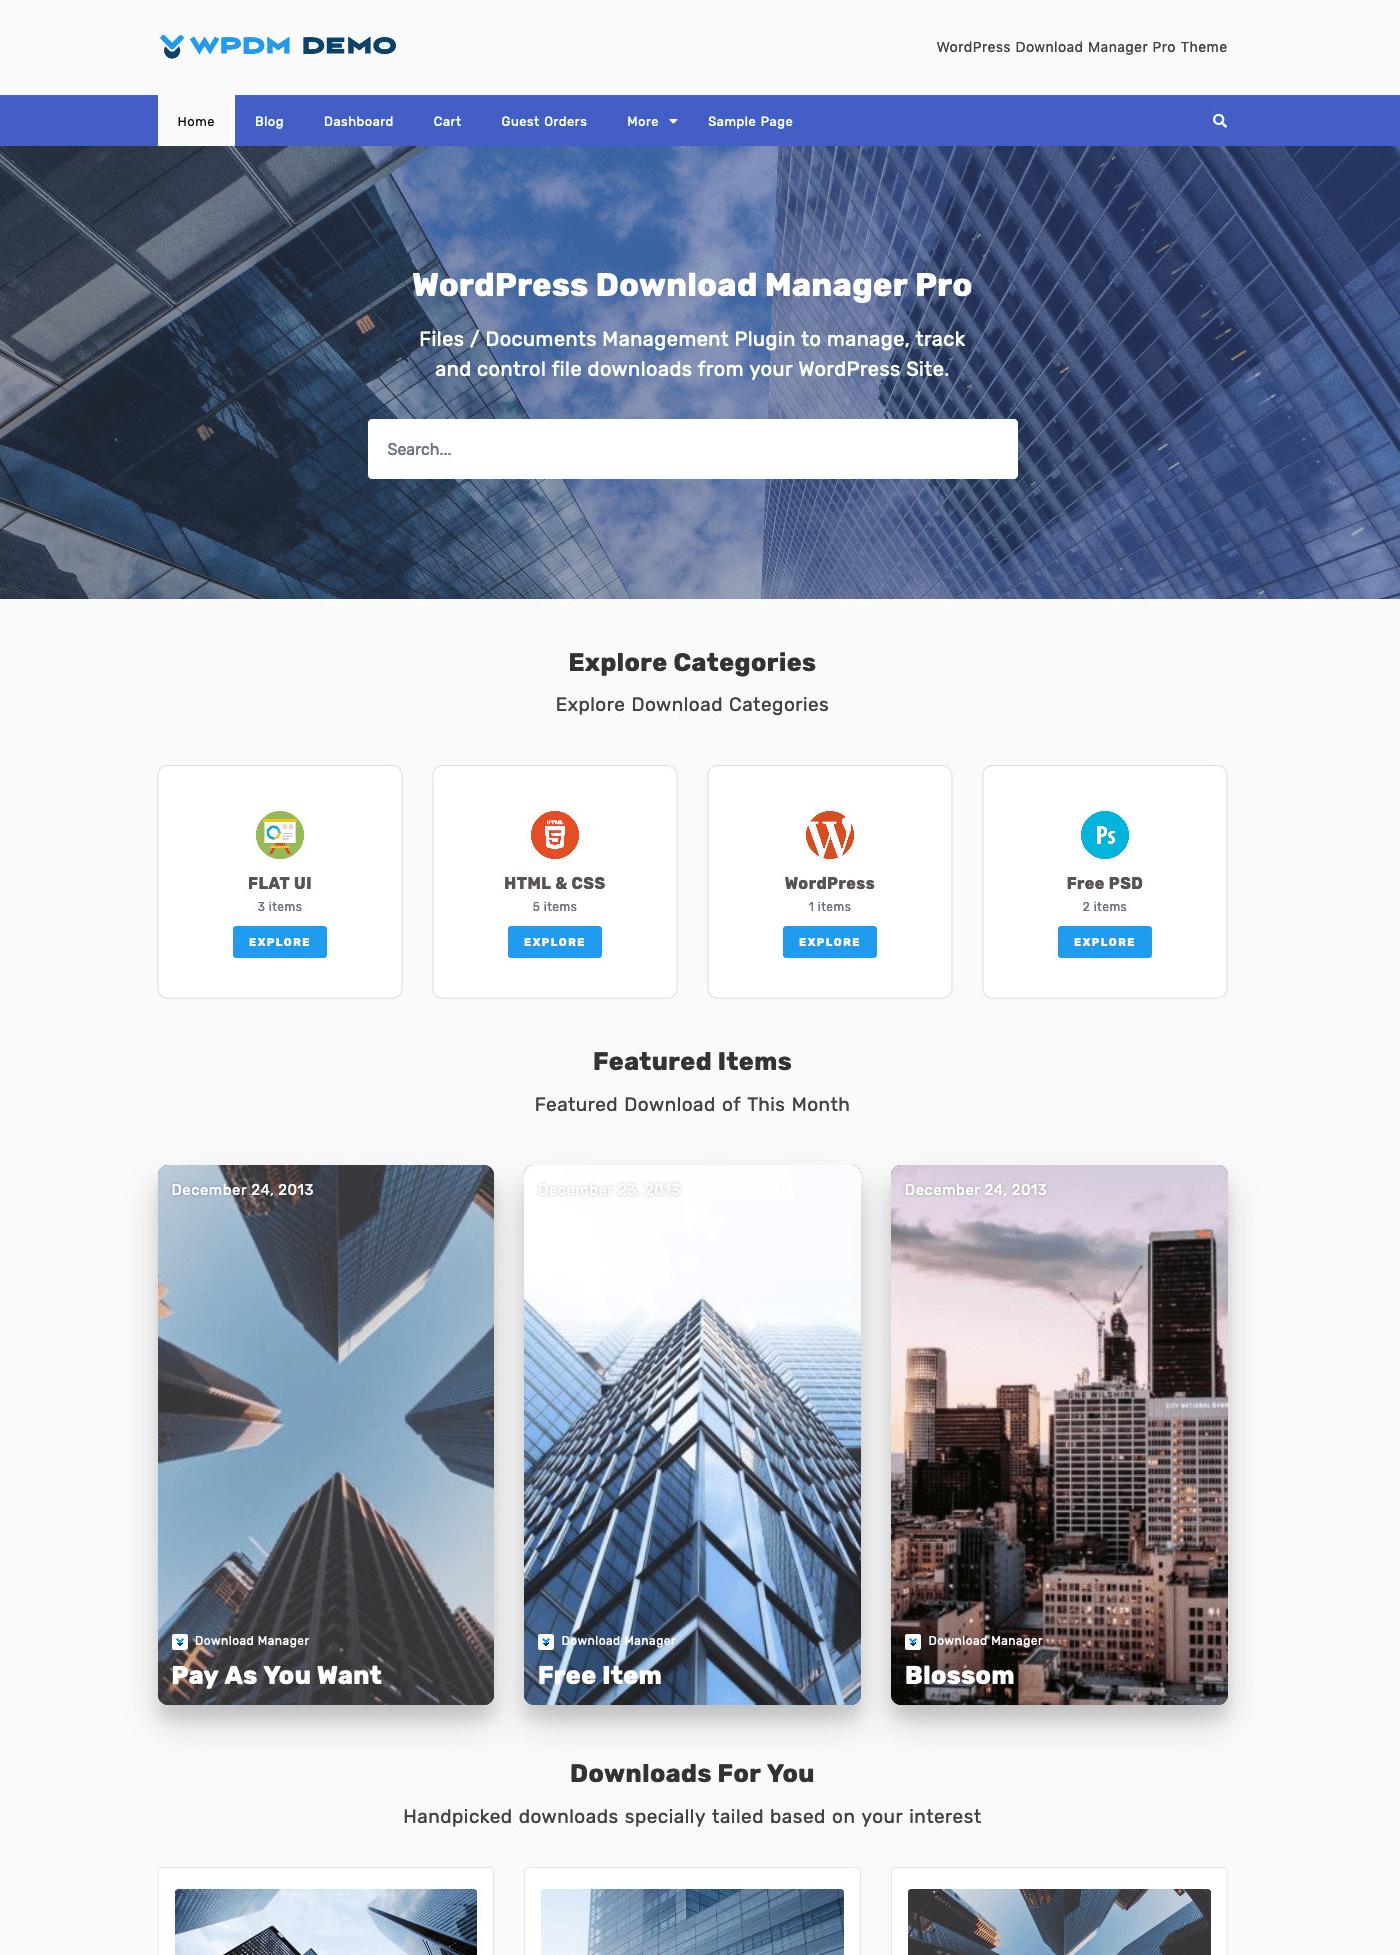 Attire - WordPress Download Manager Pro Theme